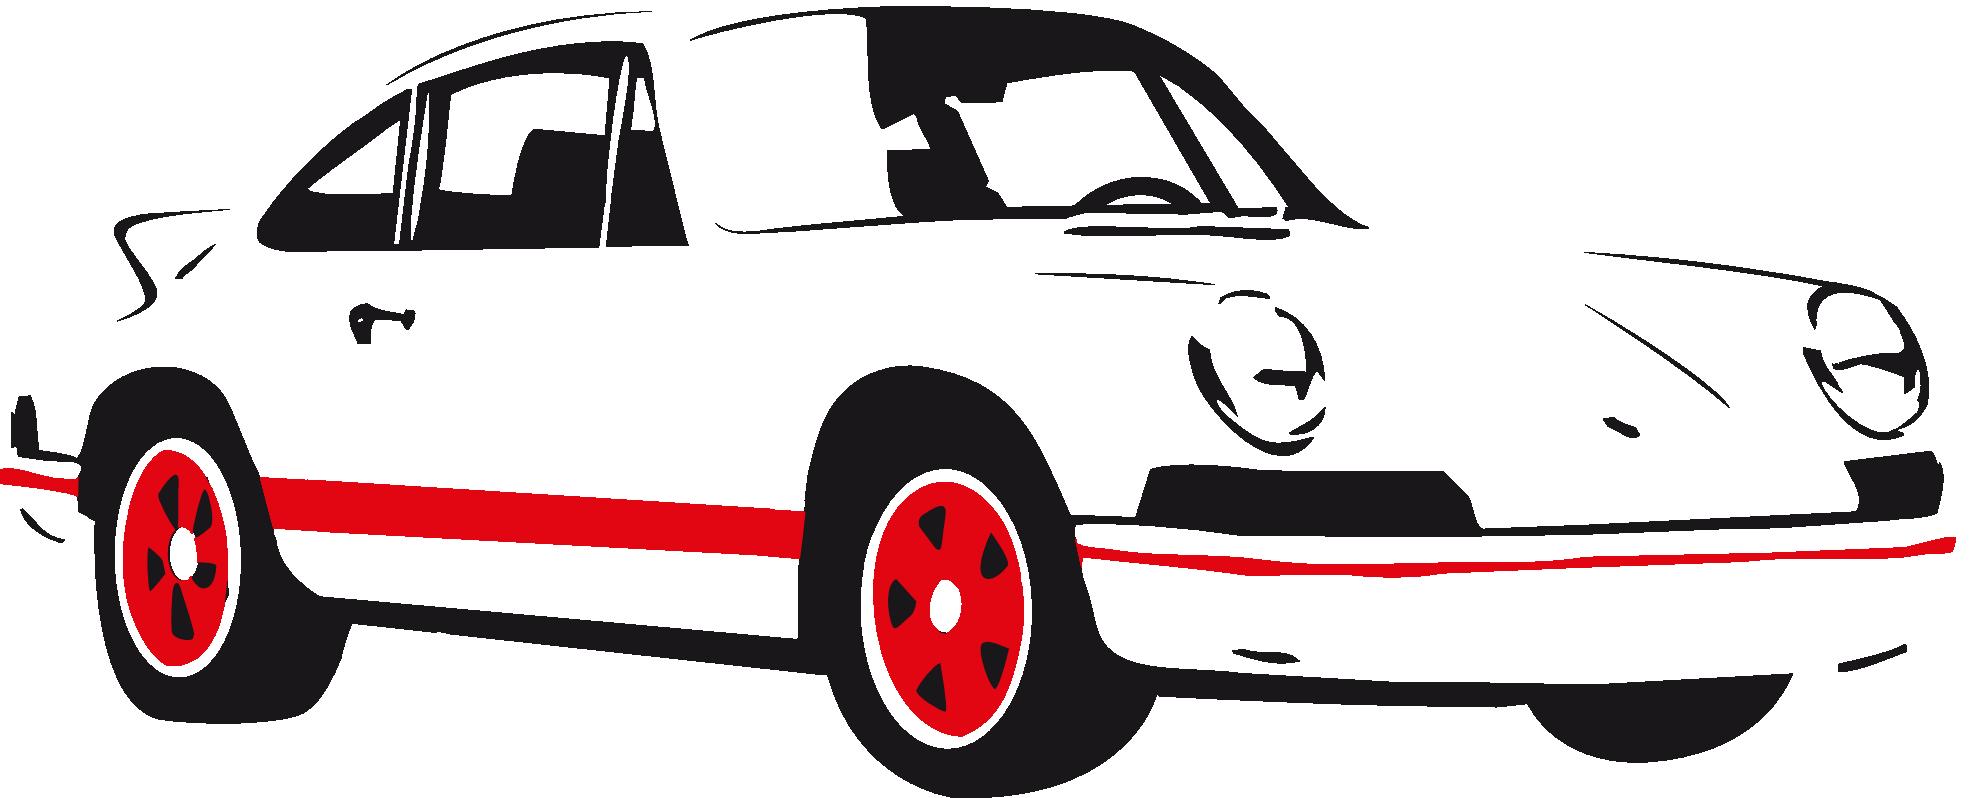 1969x798 Sports Classic Car Clipart